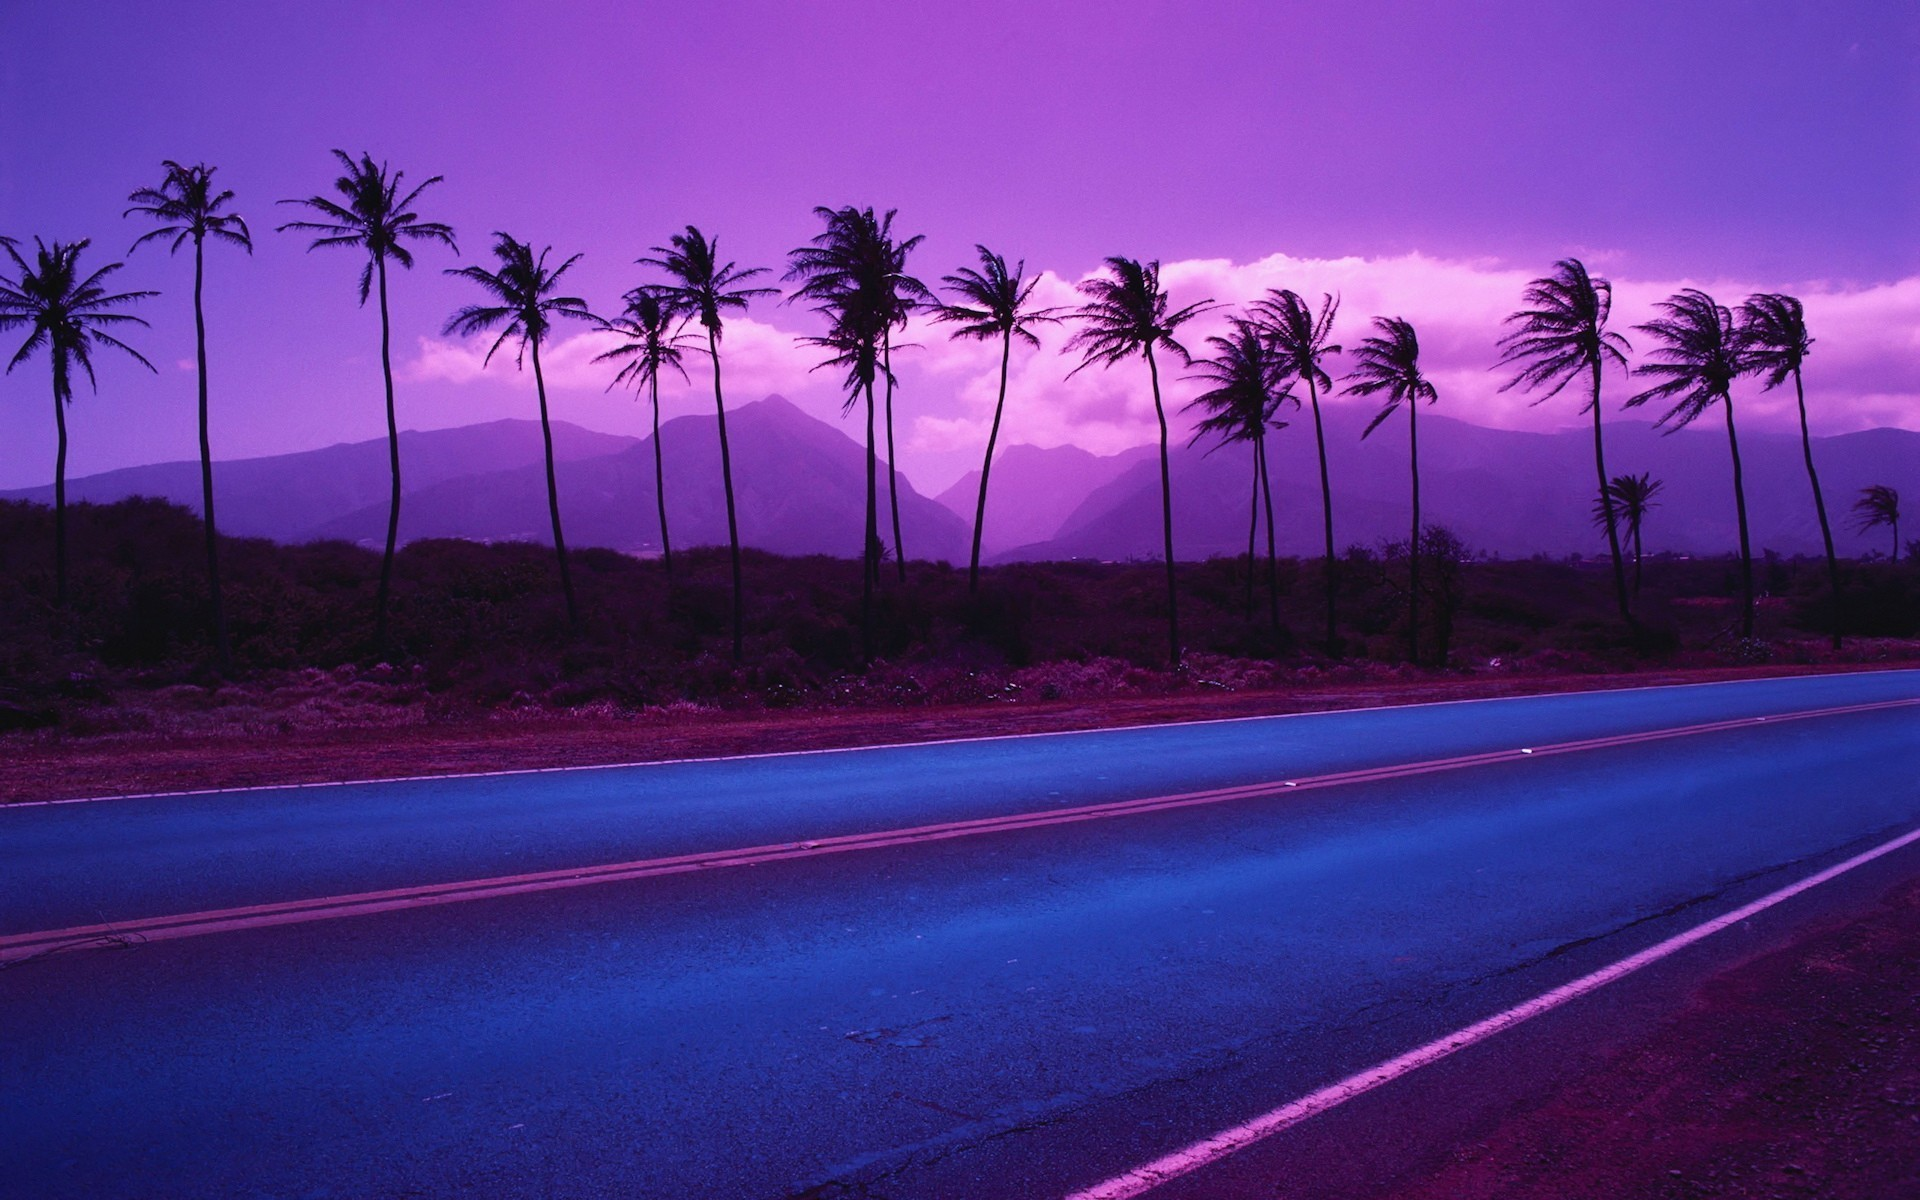 Purple Palm Trees Wallpapers Purple Palm Trees Myspace Backgrounds 1920x1200